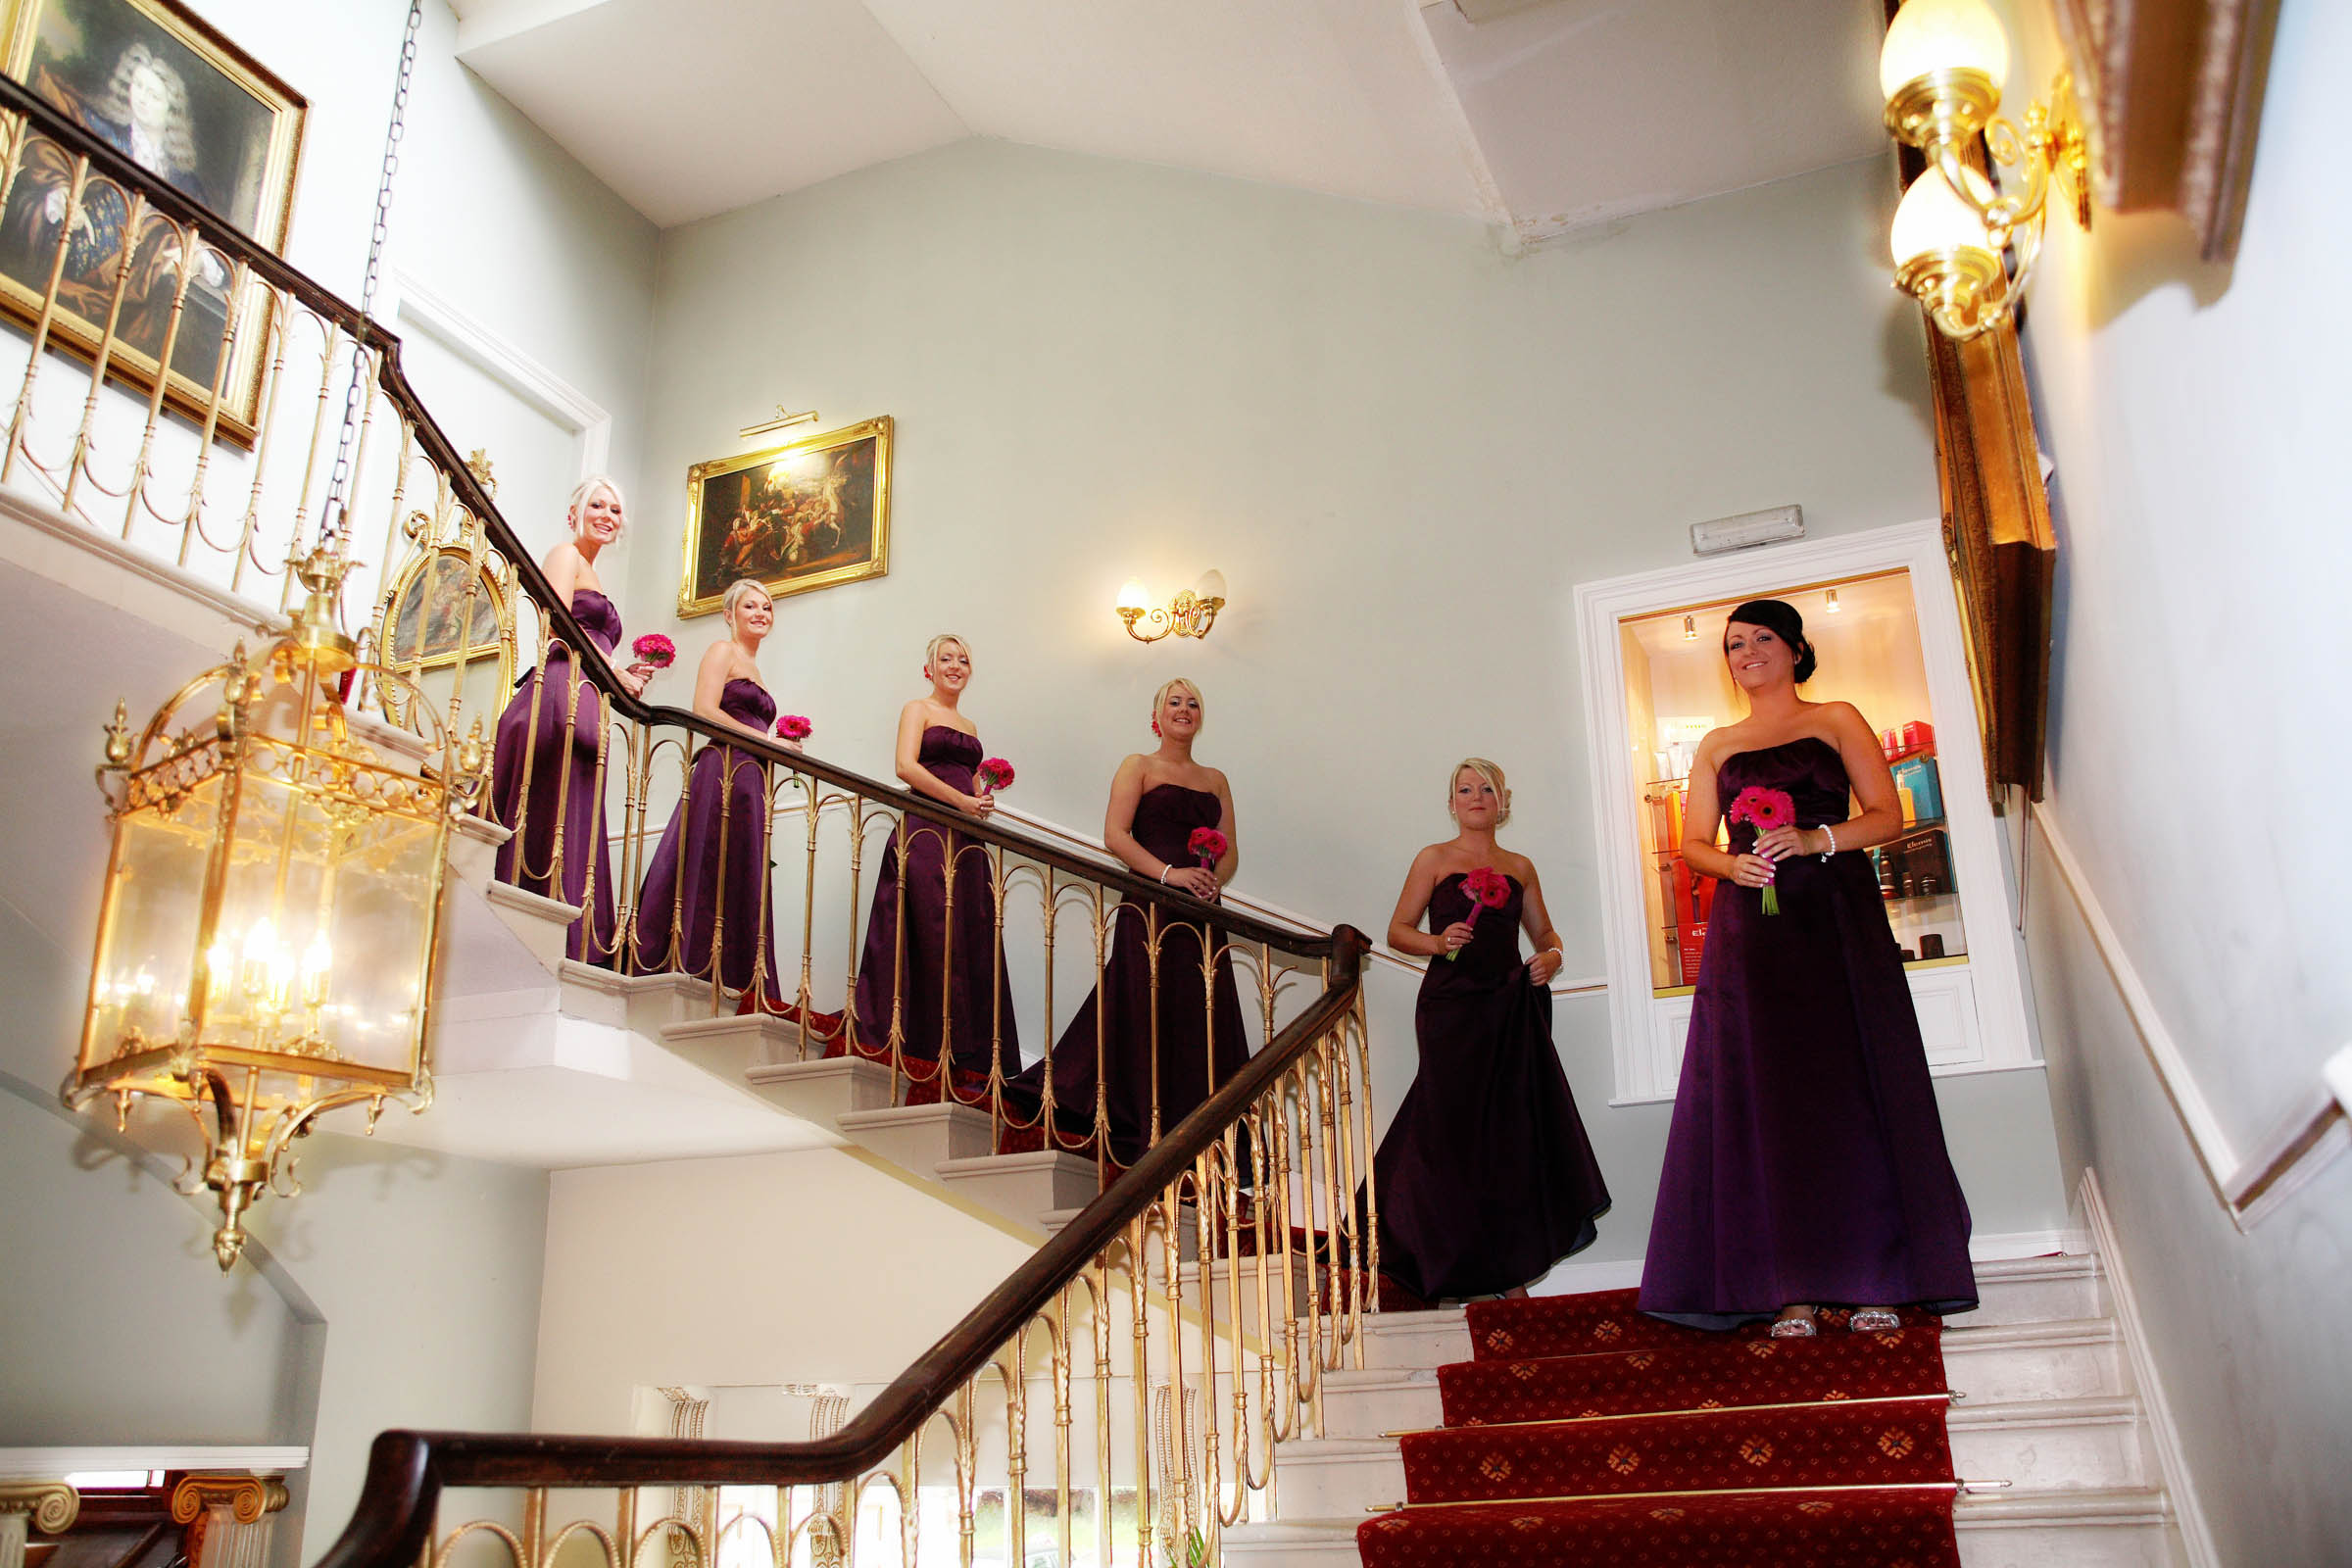 Bridesmaids_staircase_wedding_photography_Edinburgh.jpg